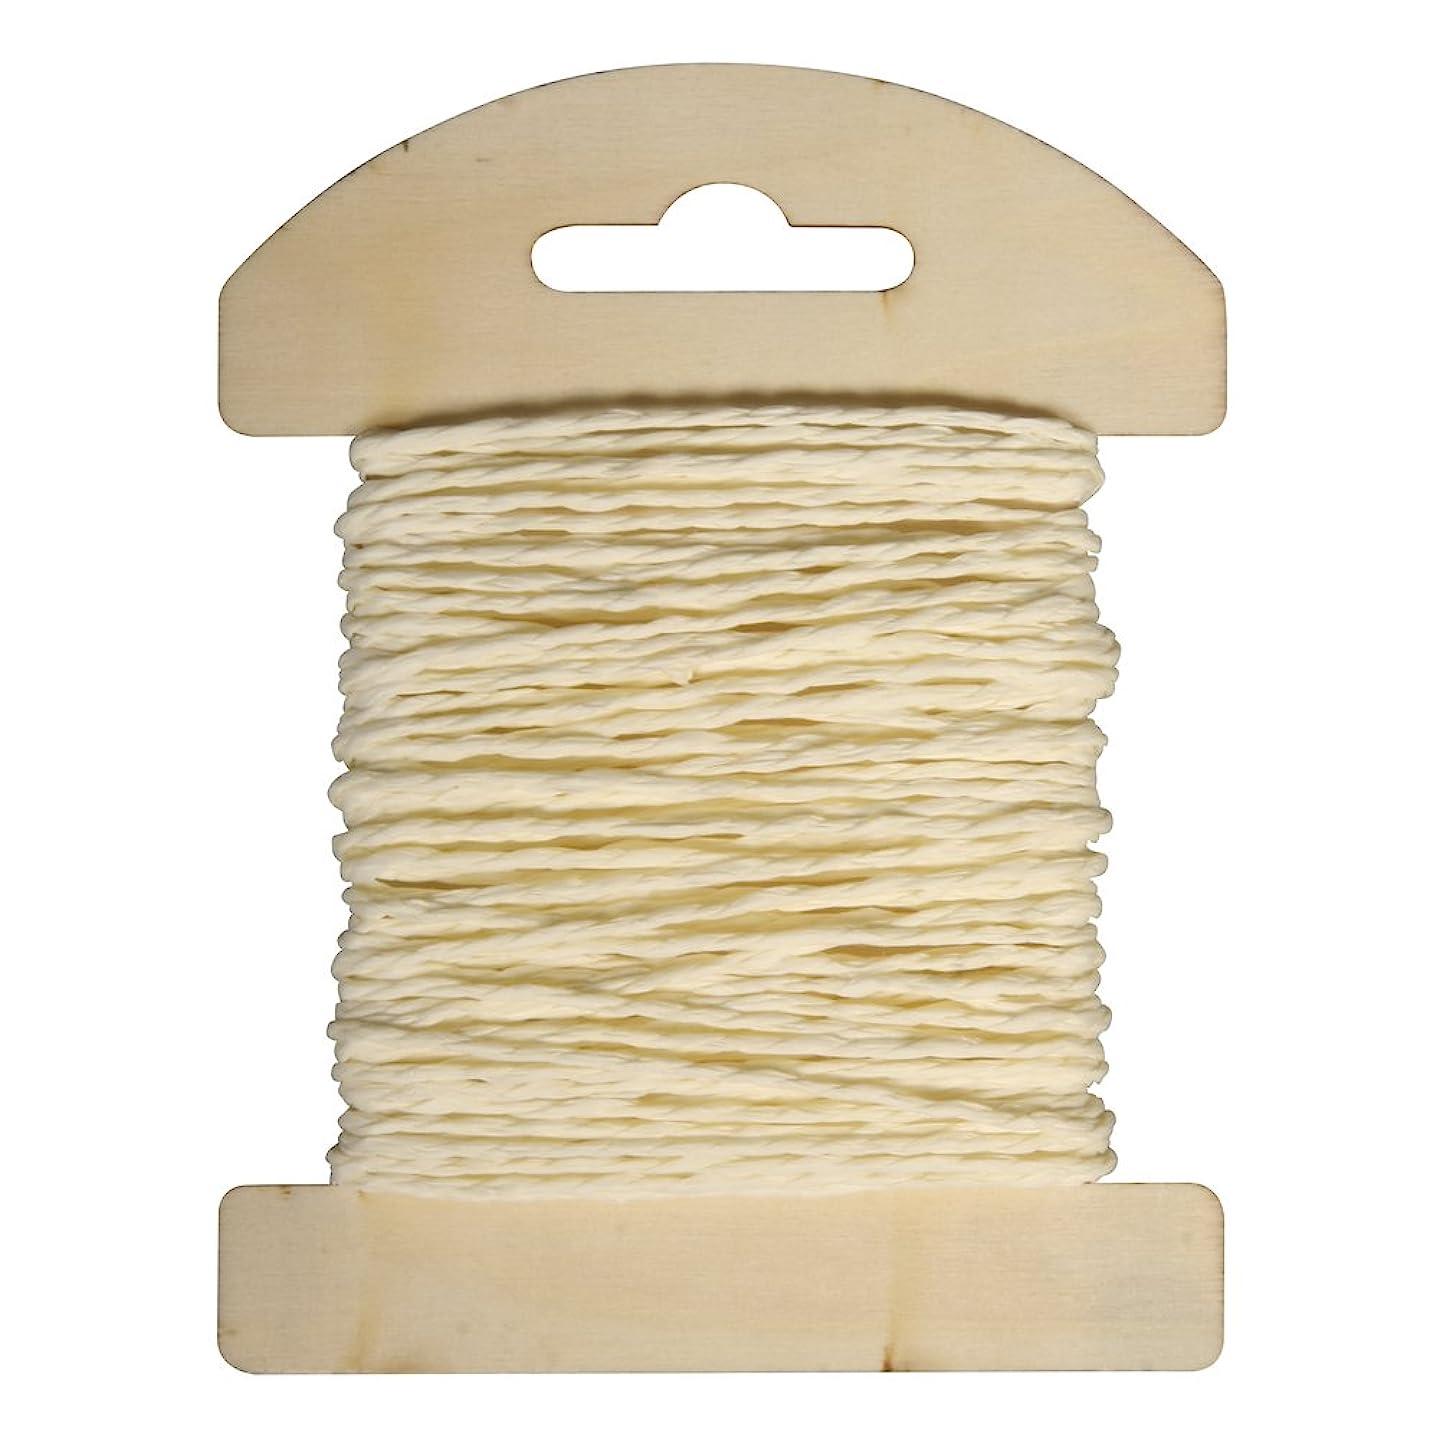 Rayher 55352154 Paper Cord 1.2 mm Diameter on Wooden Card 10 m Vanilla